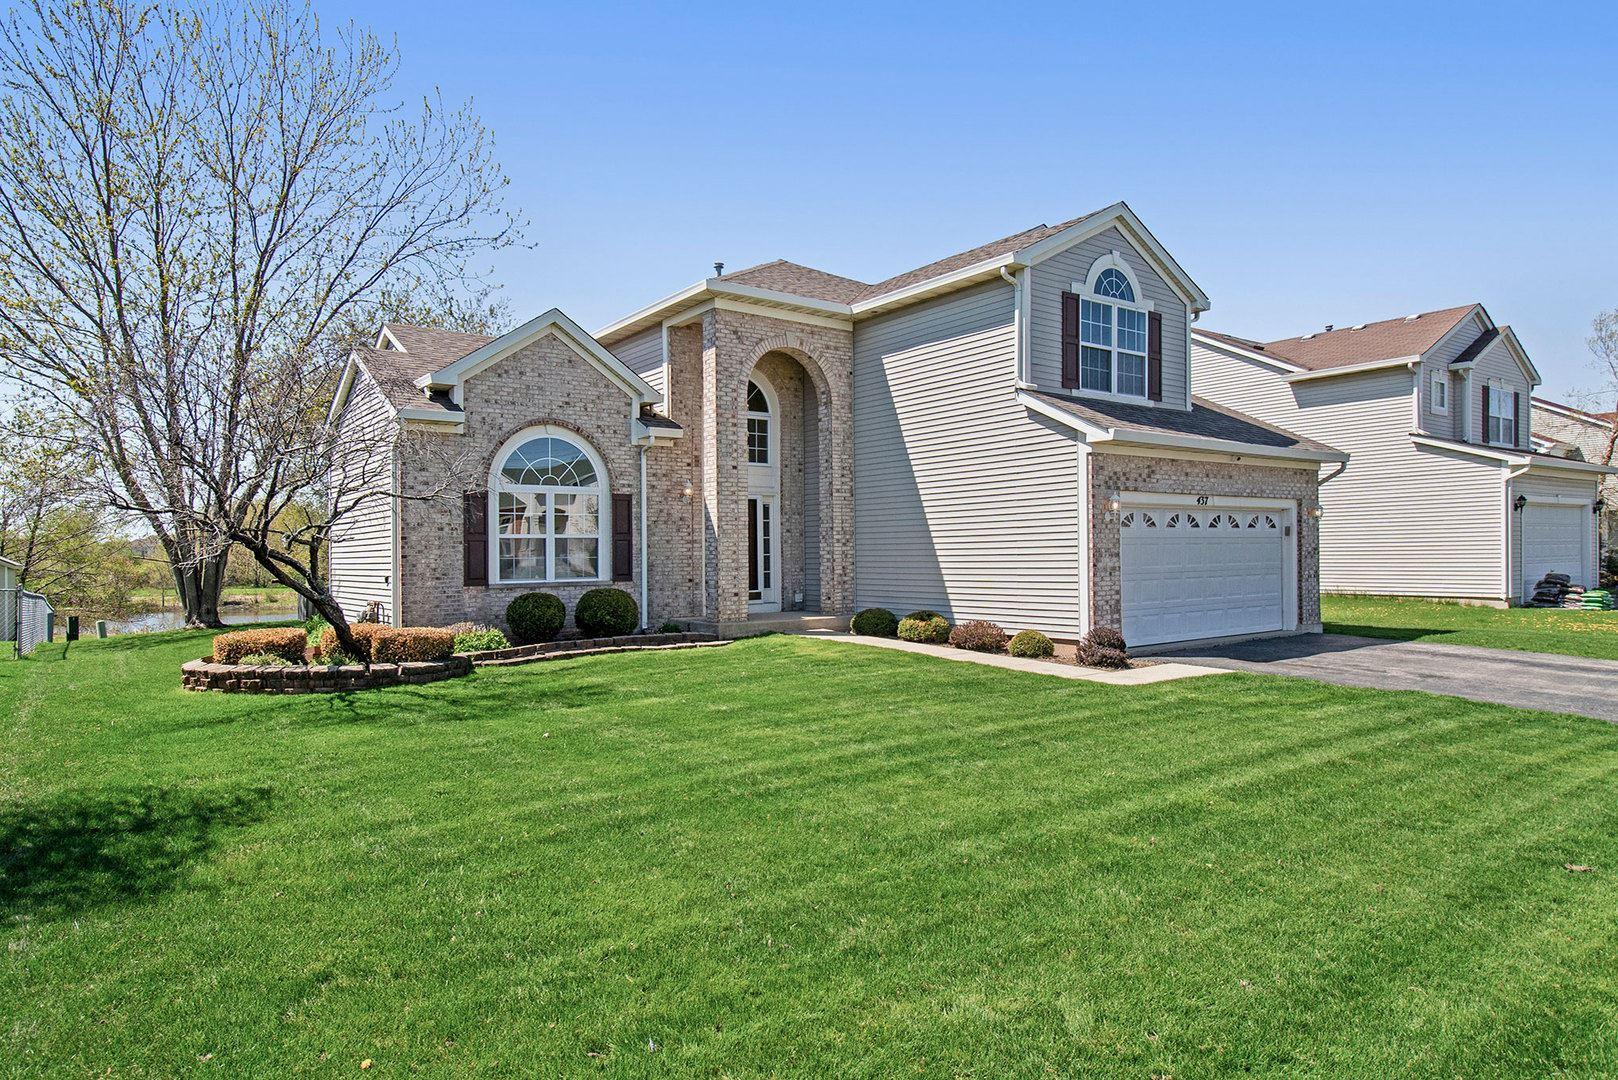 Photo of 437 S Orchard Drive, Bolingbrook, IL 60440 (MLS # 10916007)